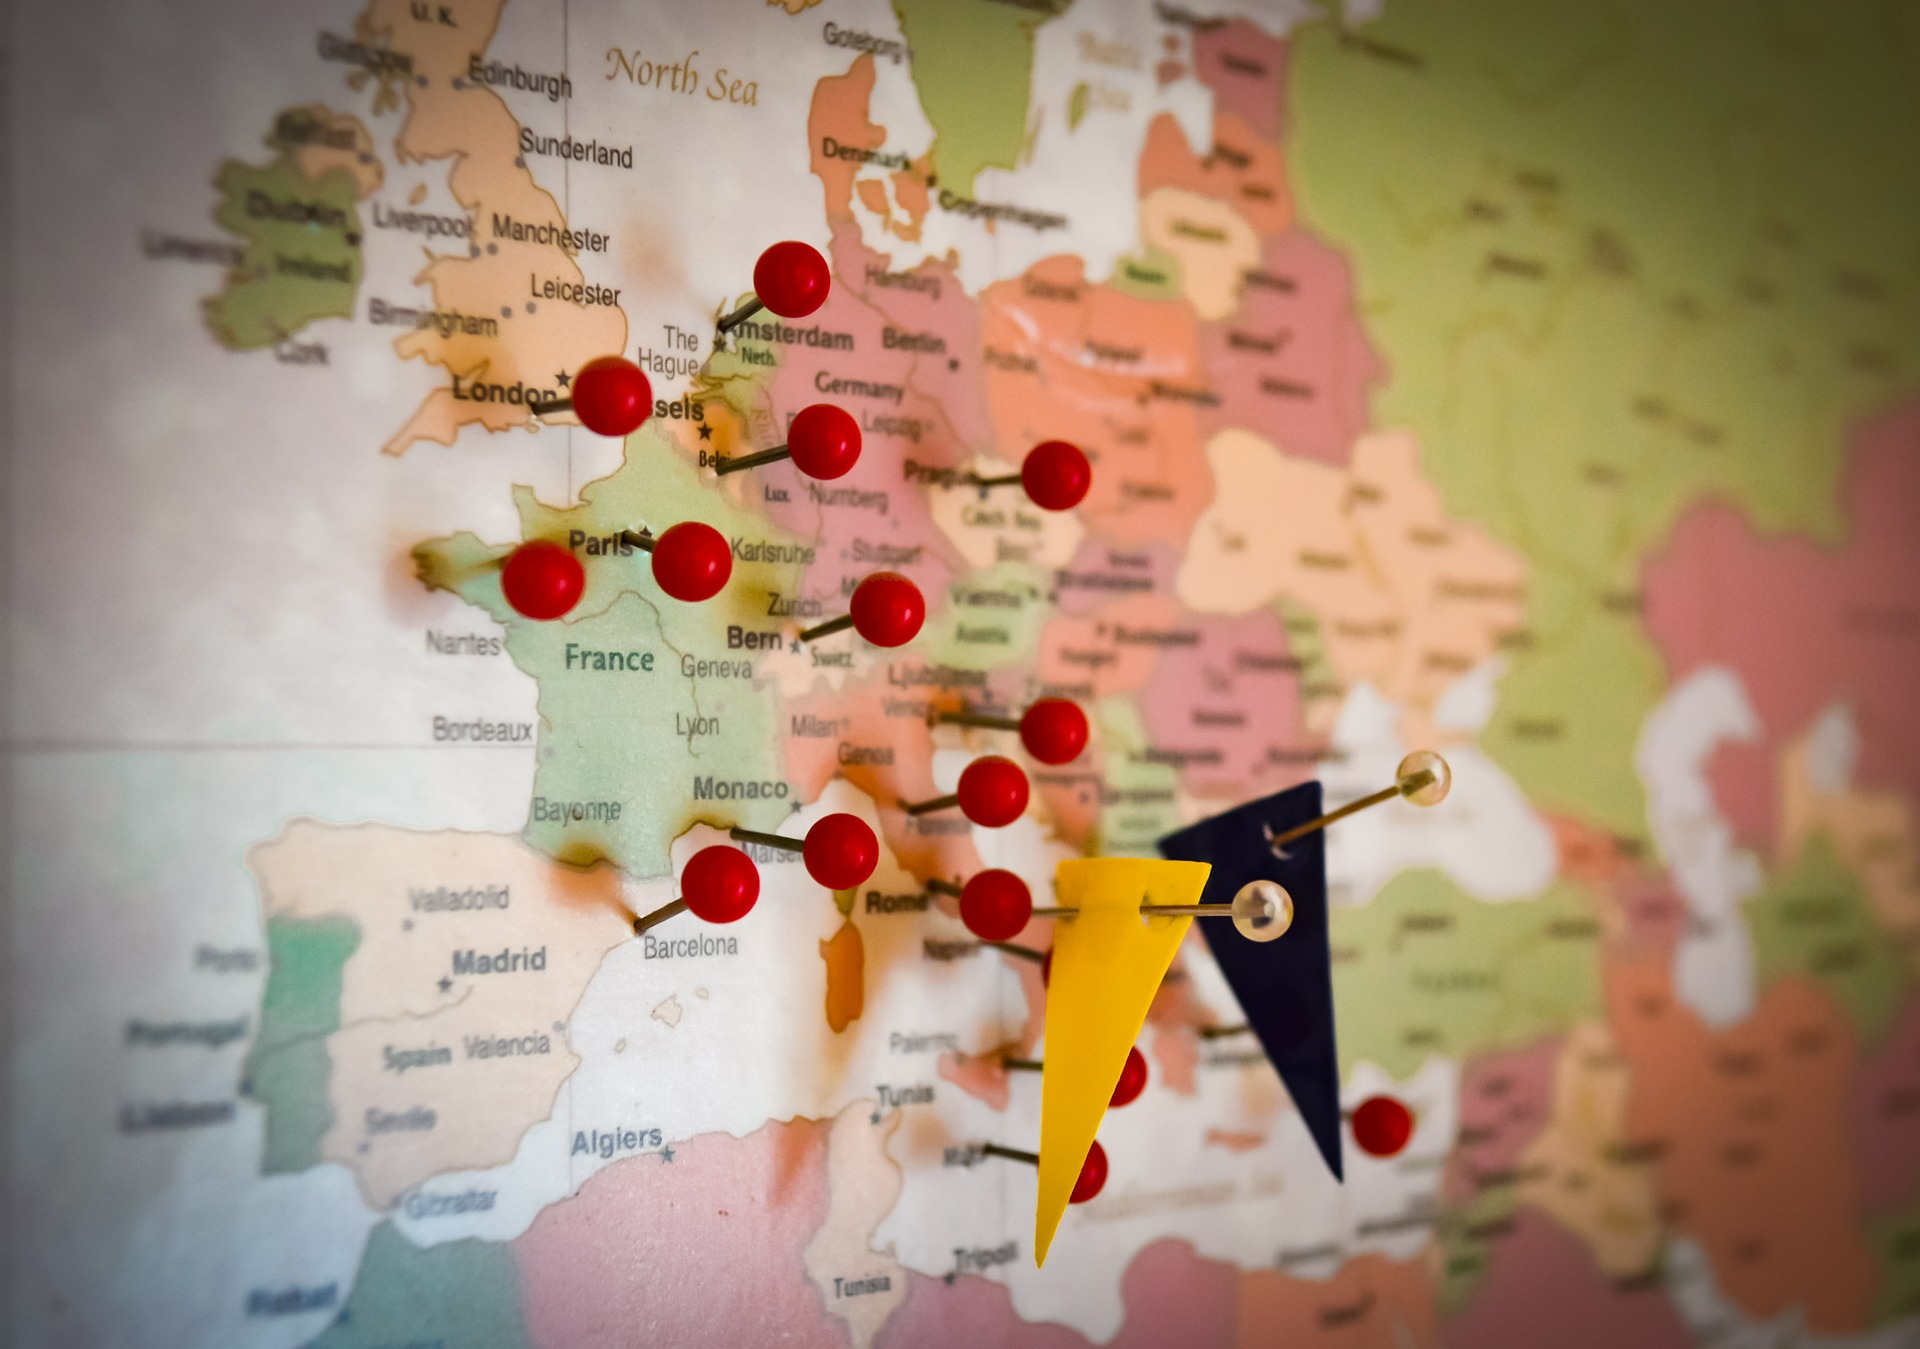 Take your chance: Freiwilligendienst in Europa